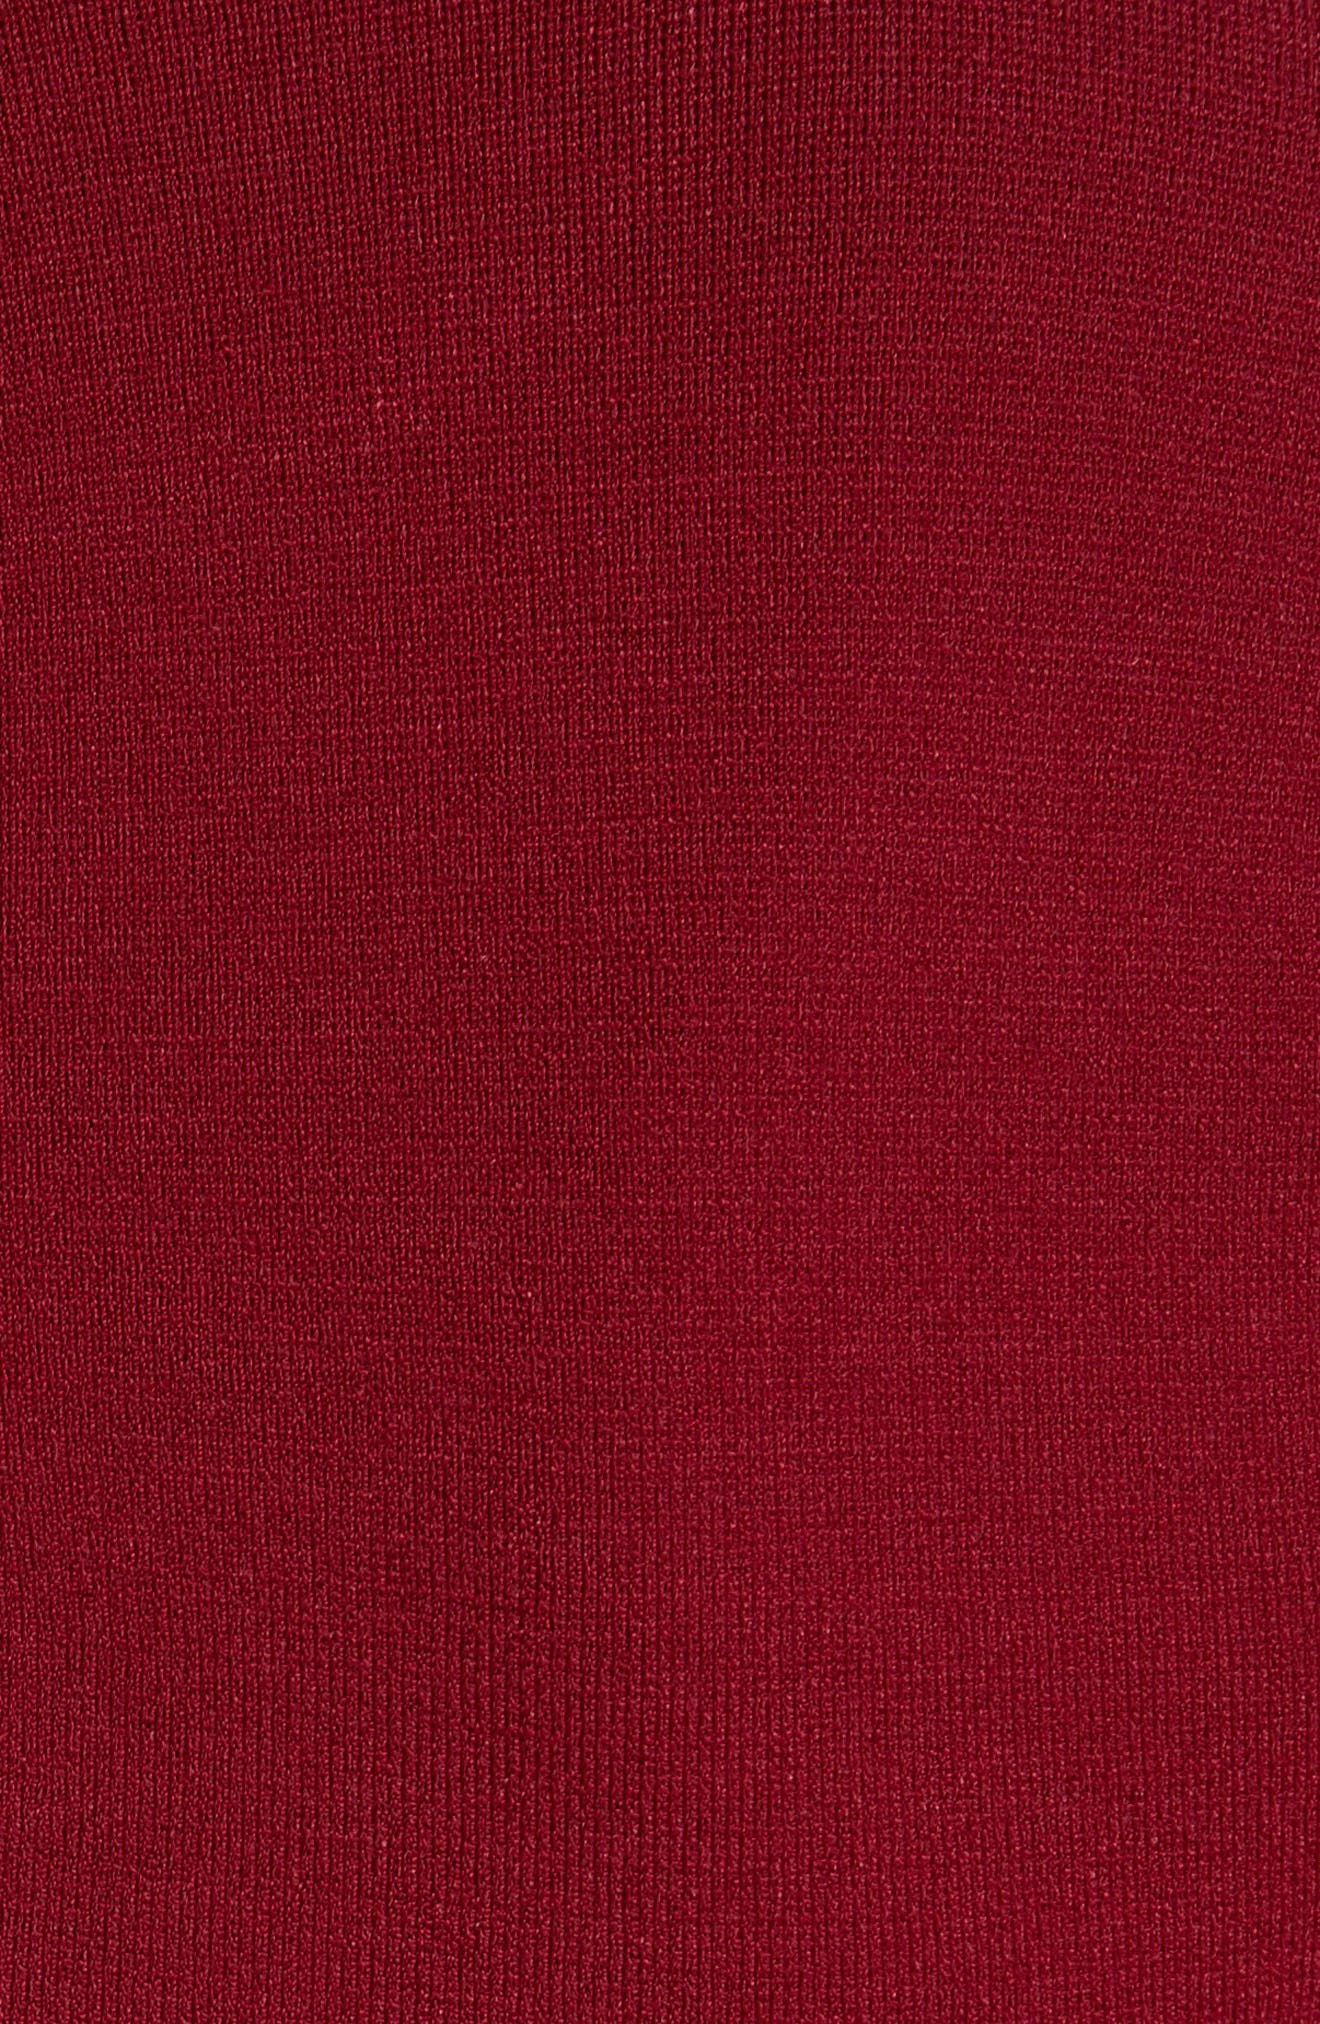 Lace Hem Knit Top,                             Alternate thumbnail 5, color,                             604